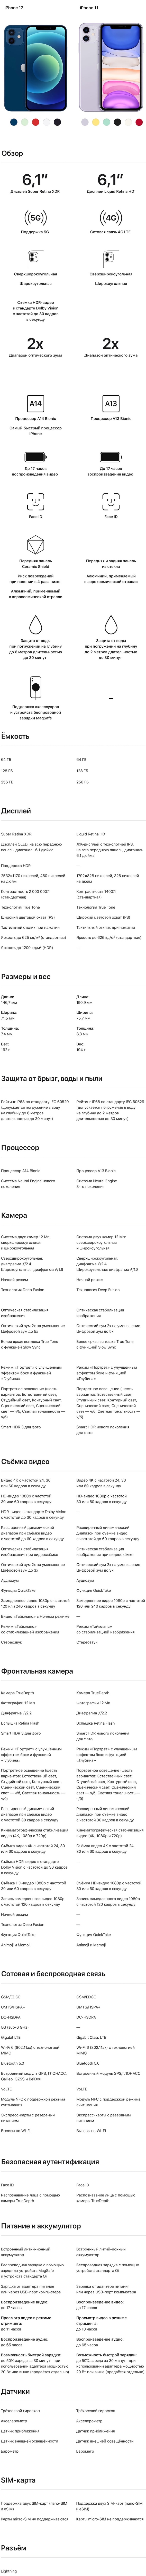 Подробное сравнение технических характеристик (спецификаций) iPhone 12 и iPhone 11